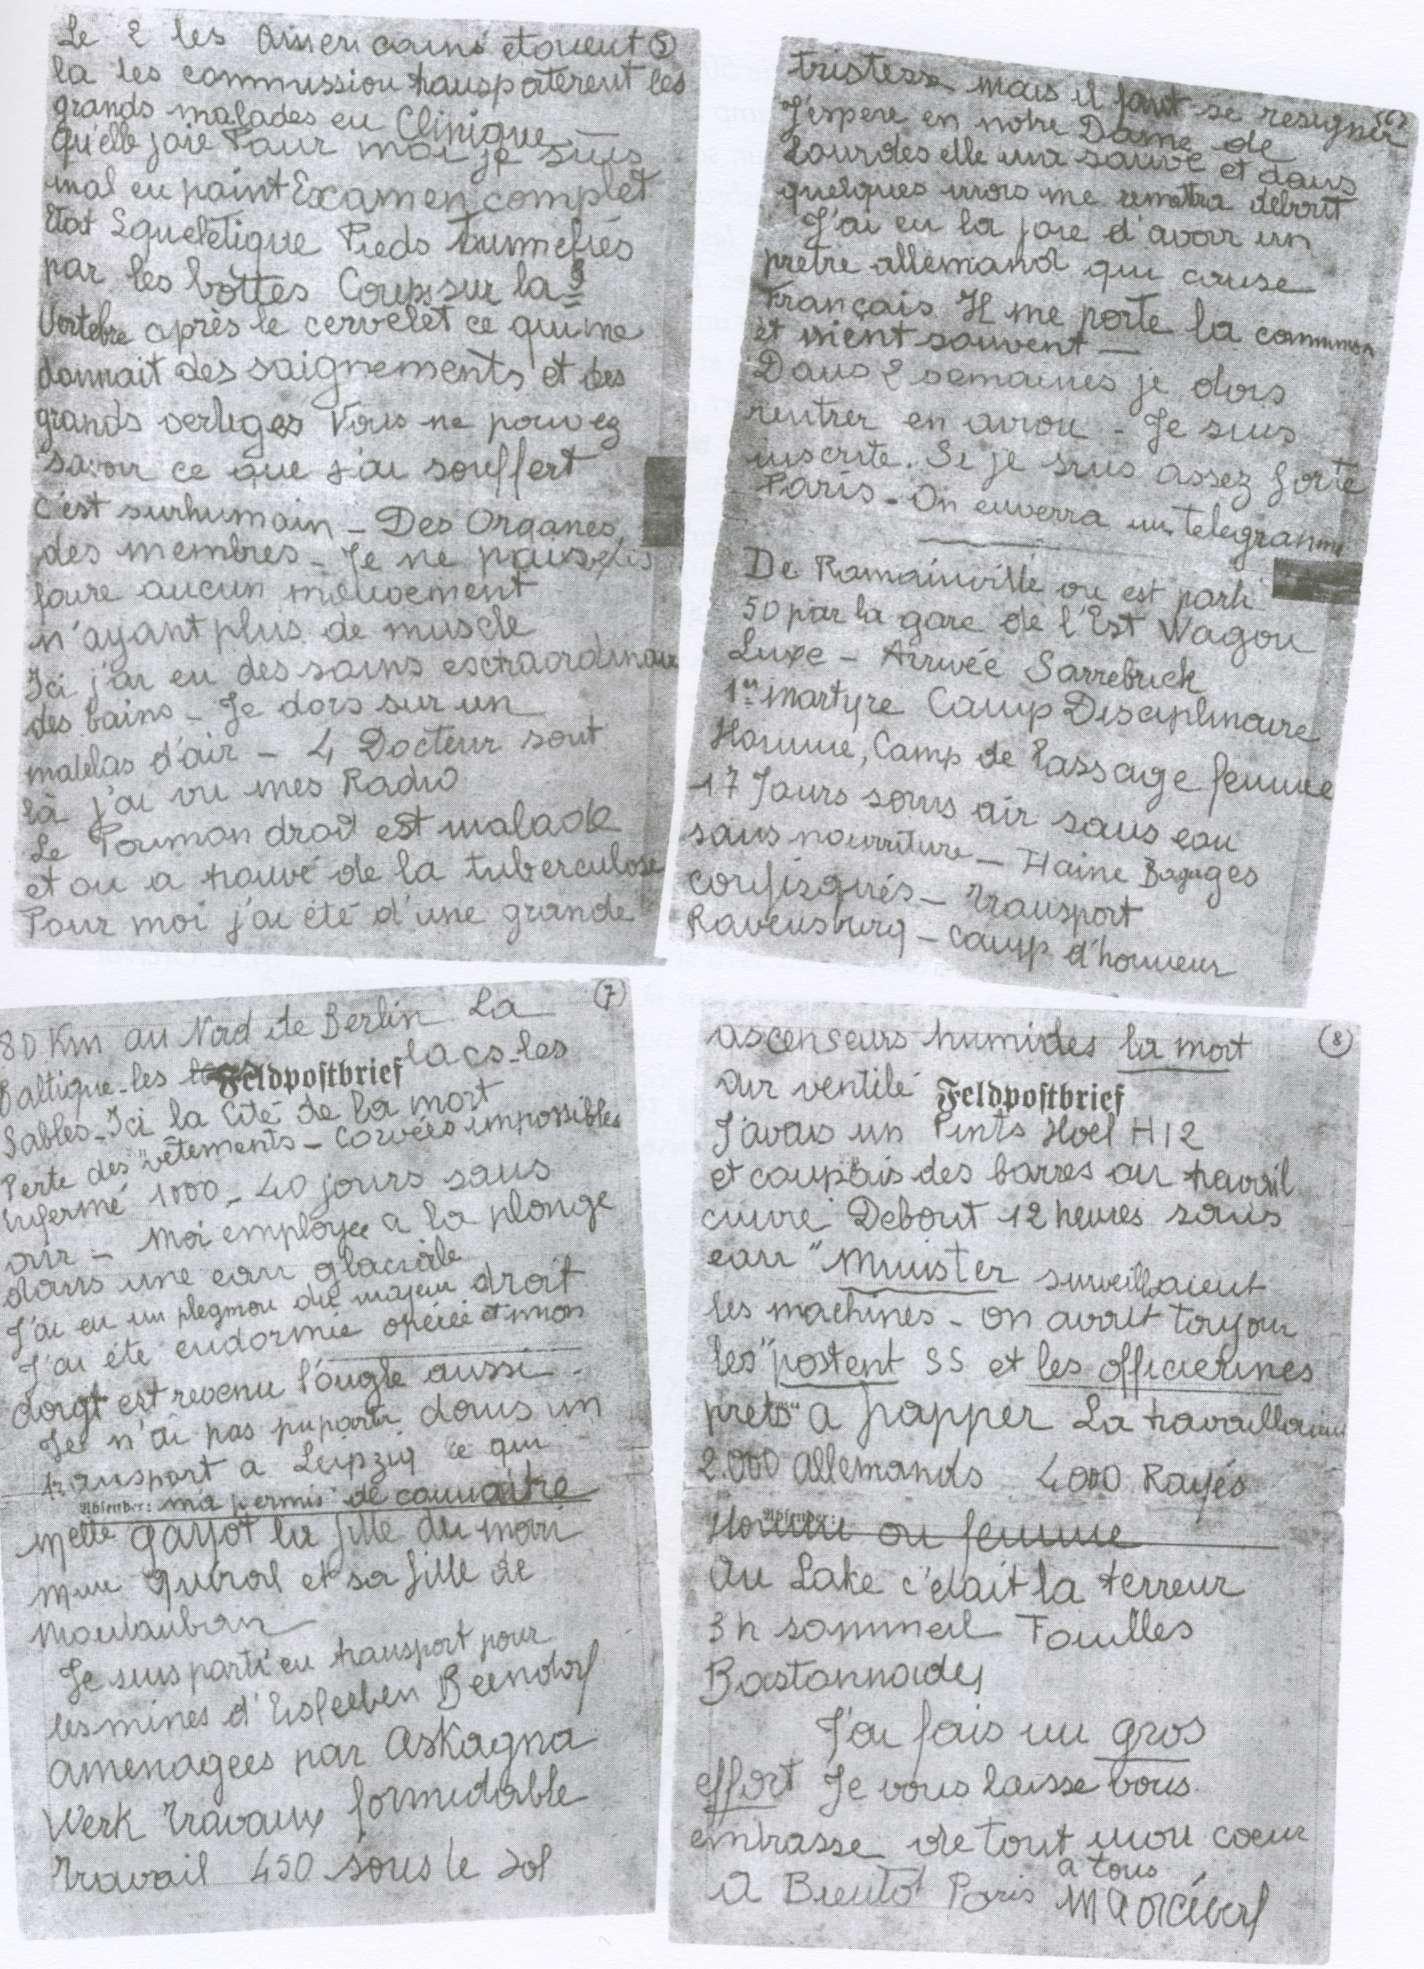 Tome3-Memoire-heurs-et-malheursPage175